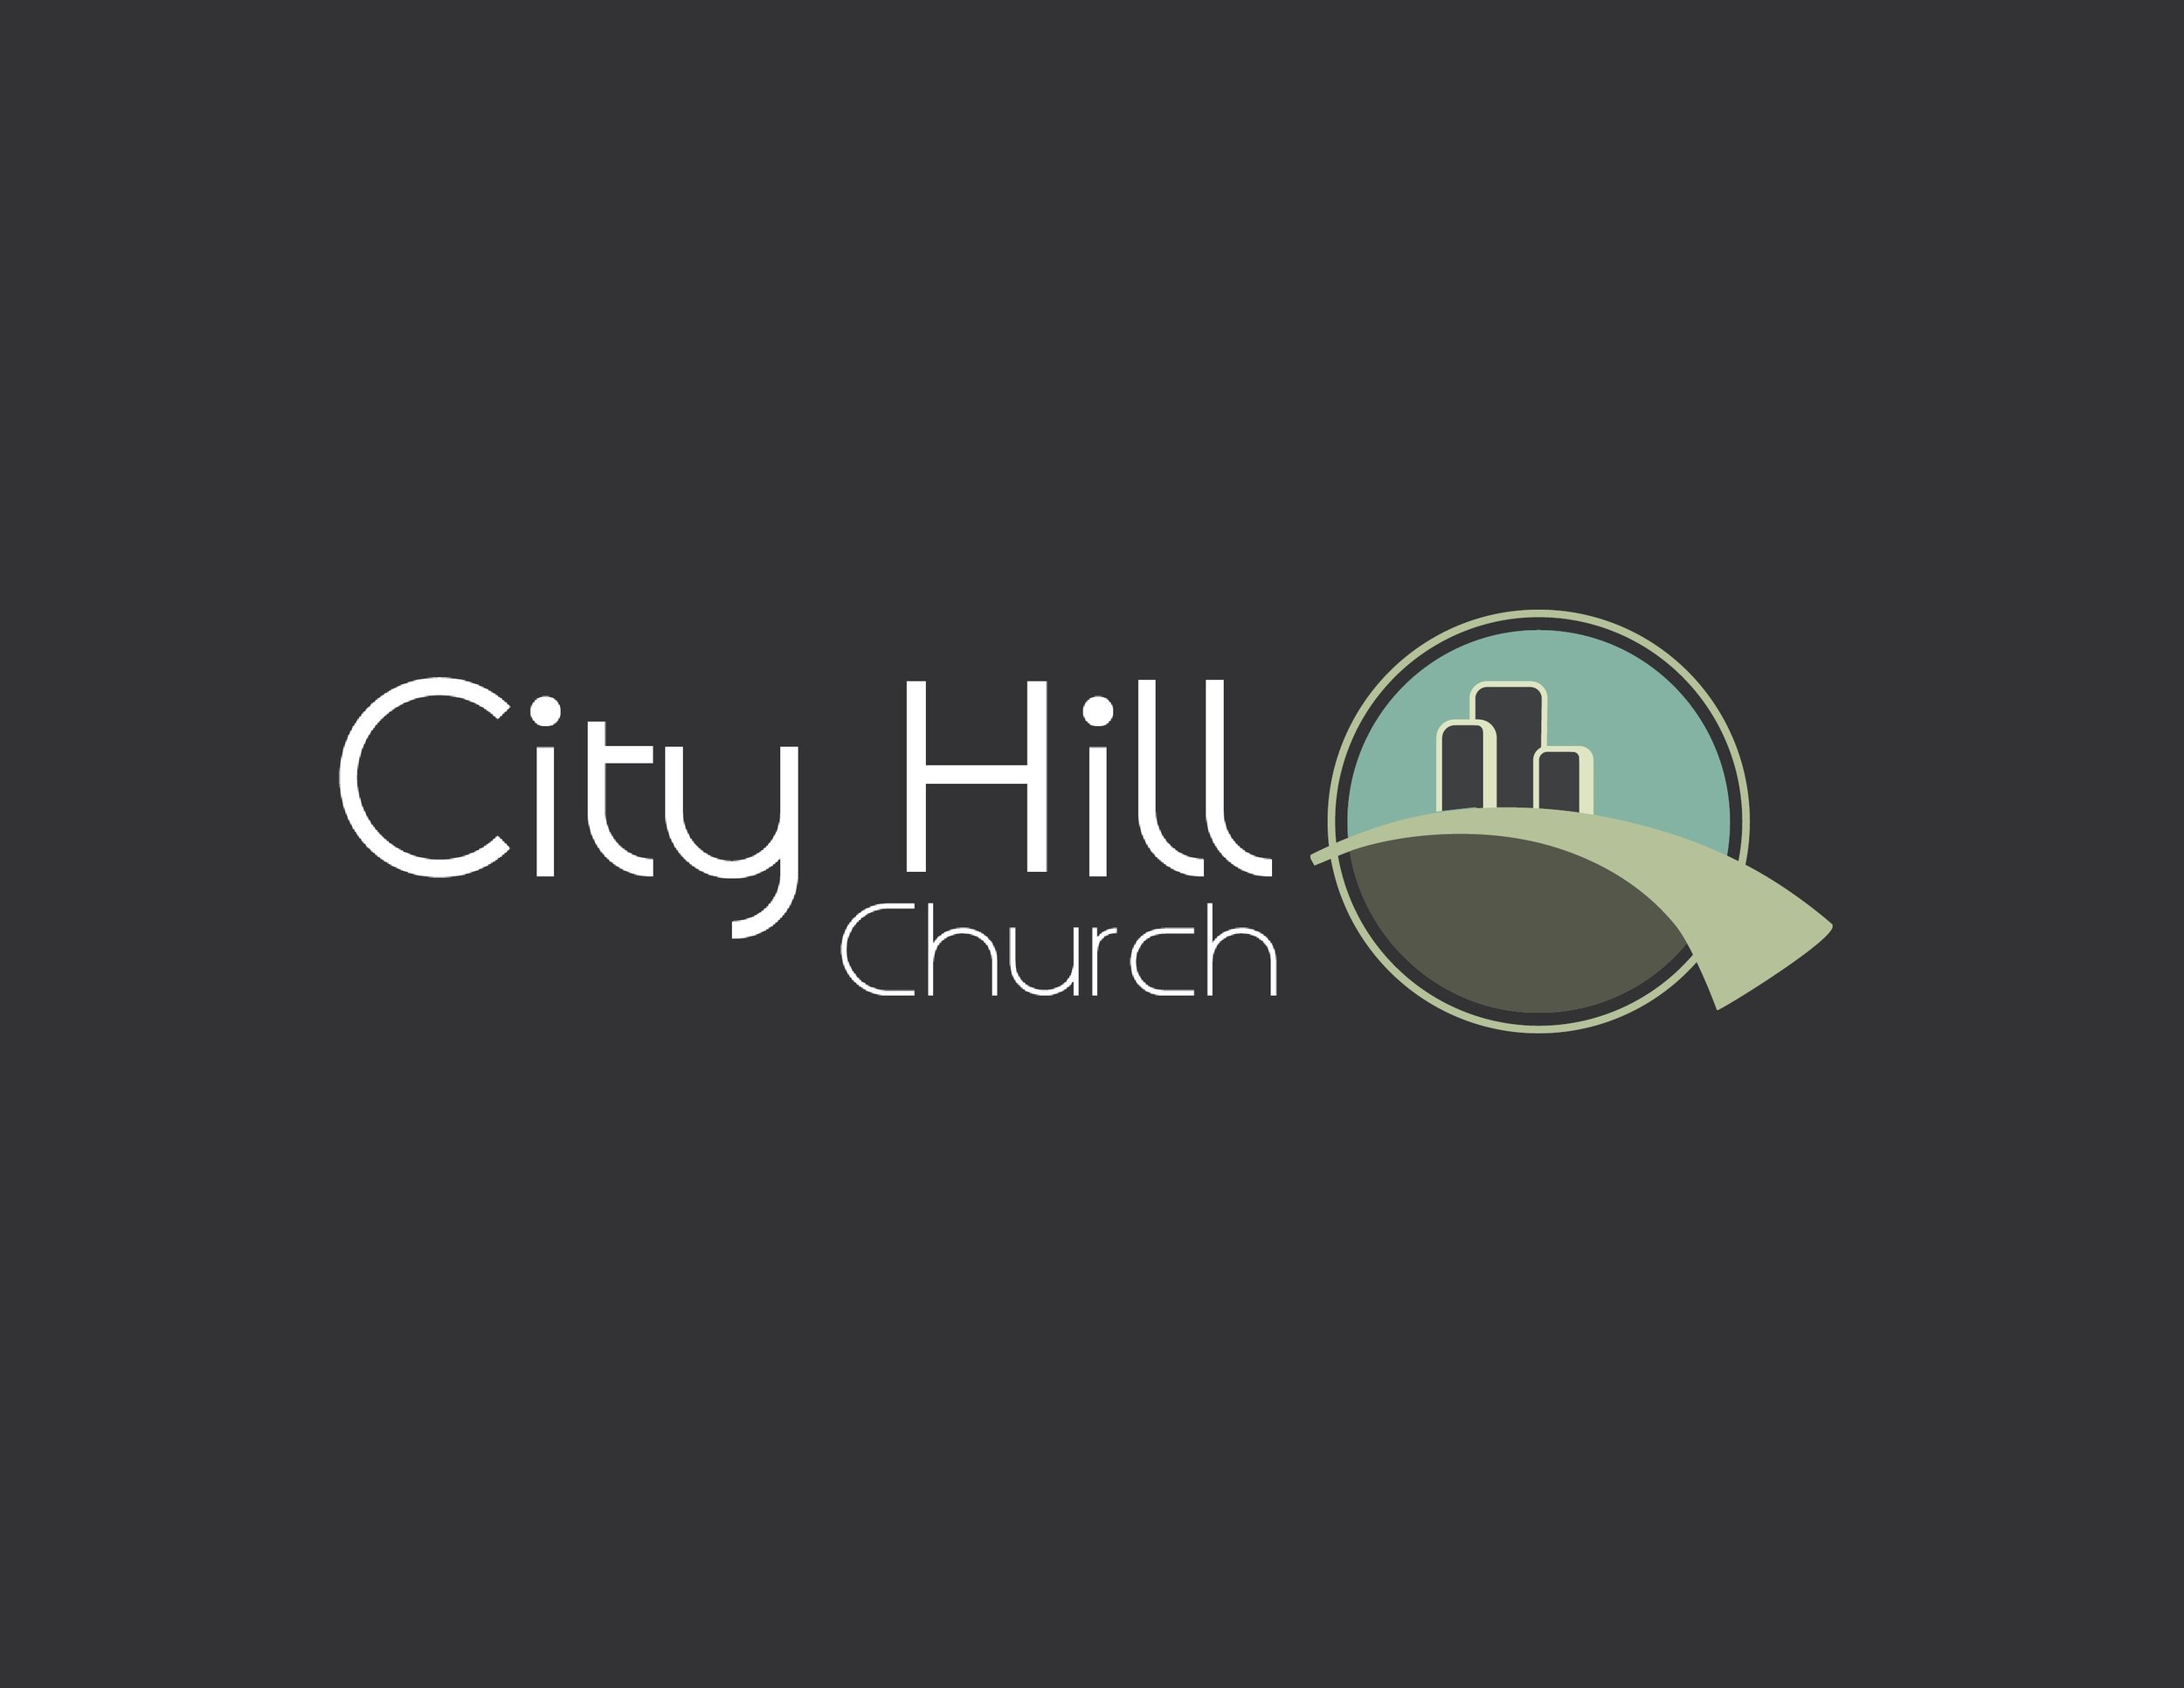 City Hill Logo_Green Top_Green Font Top_2 on Soft Black.jpg